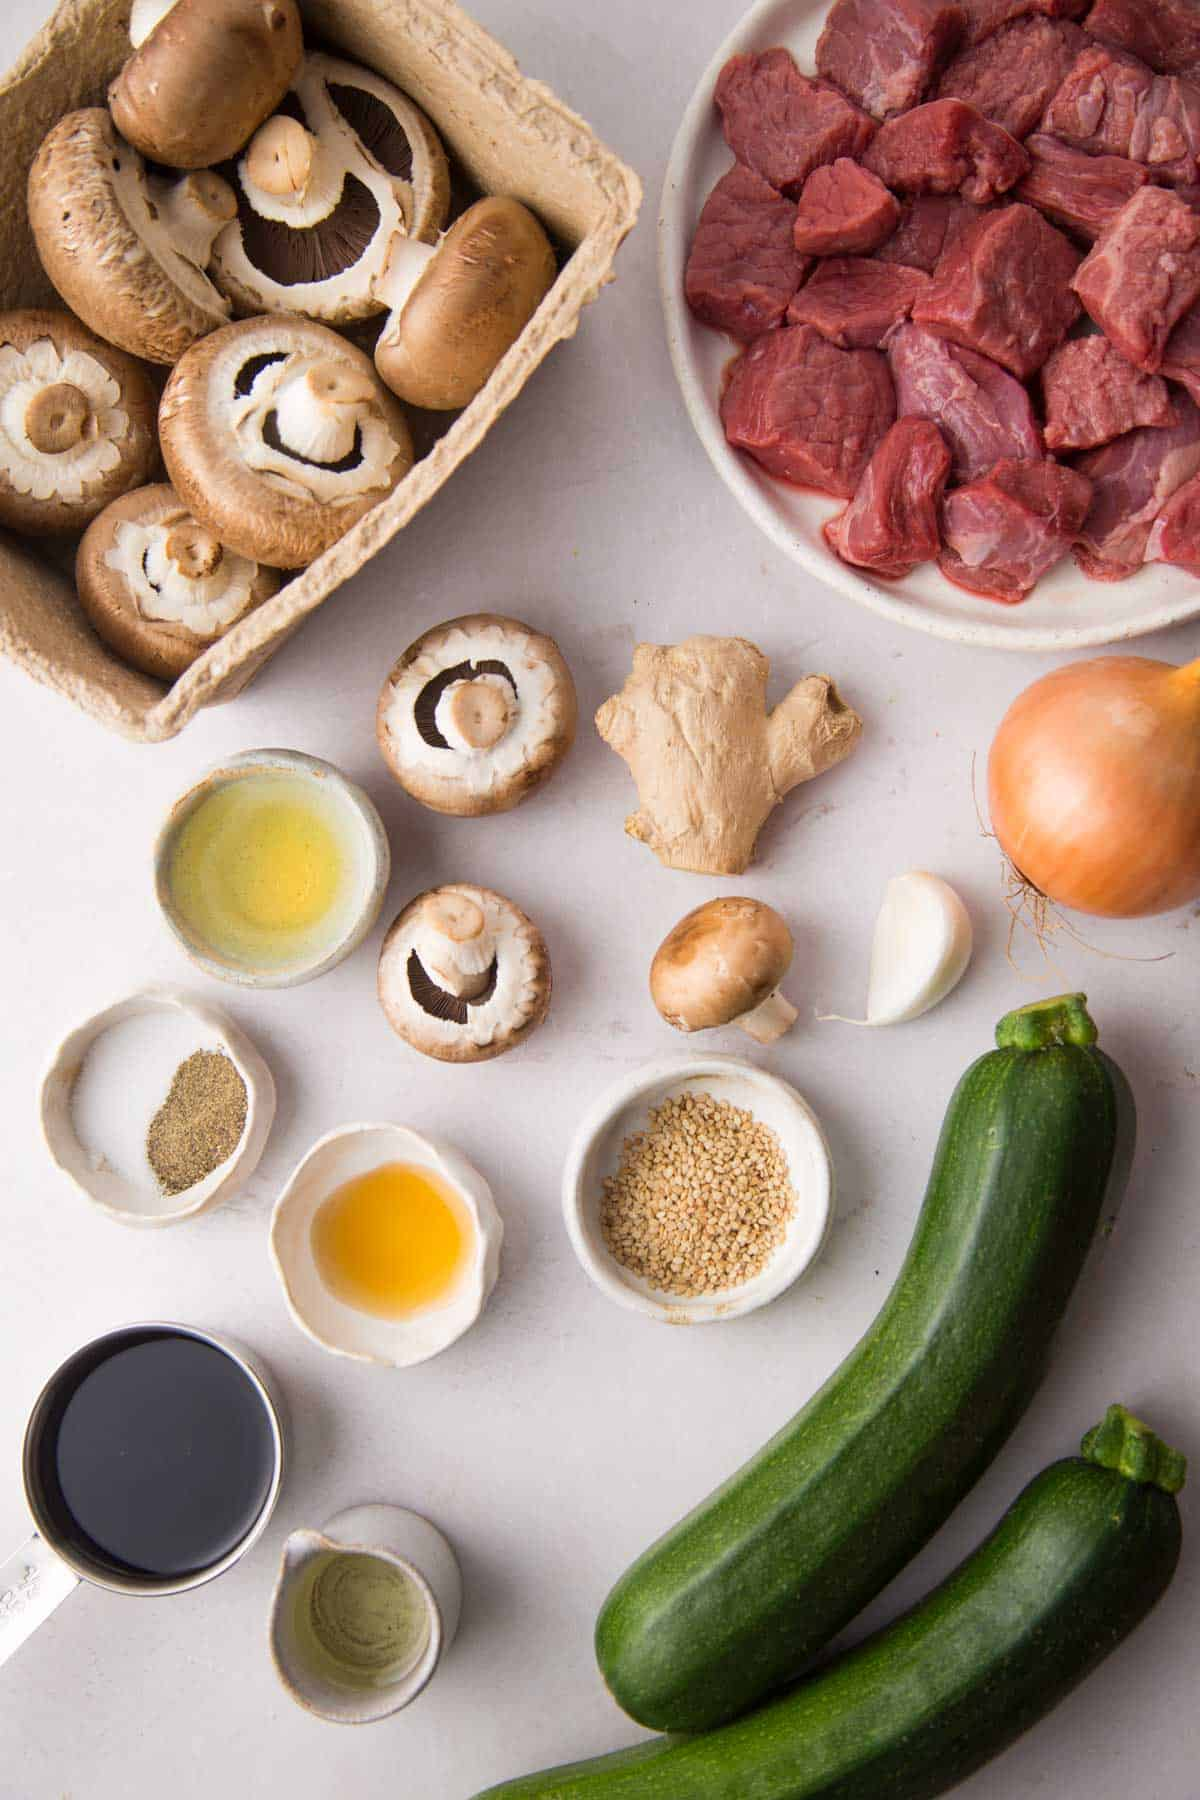 Hibachi steak ingredients